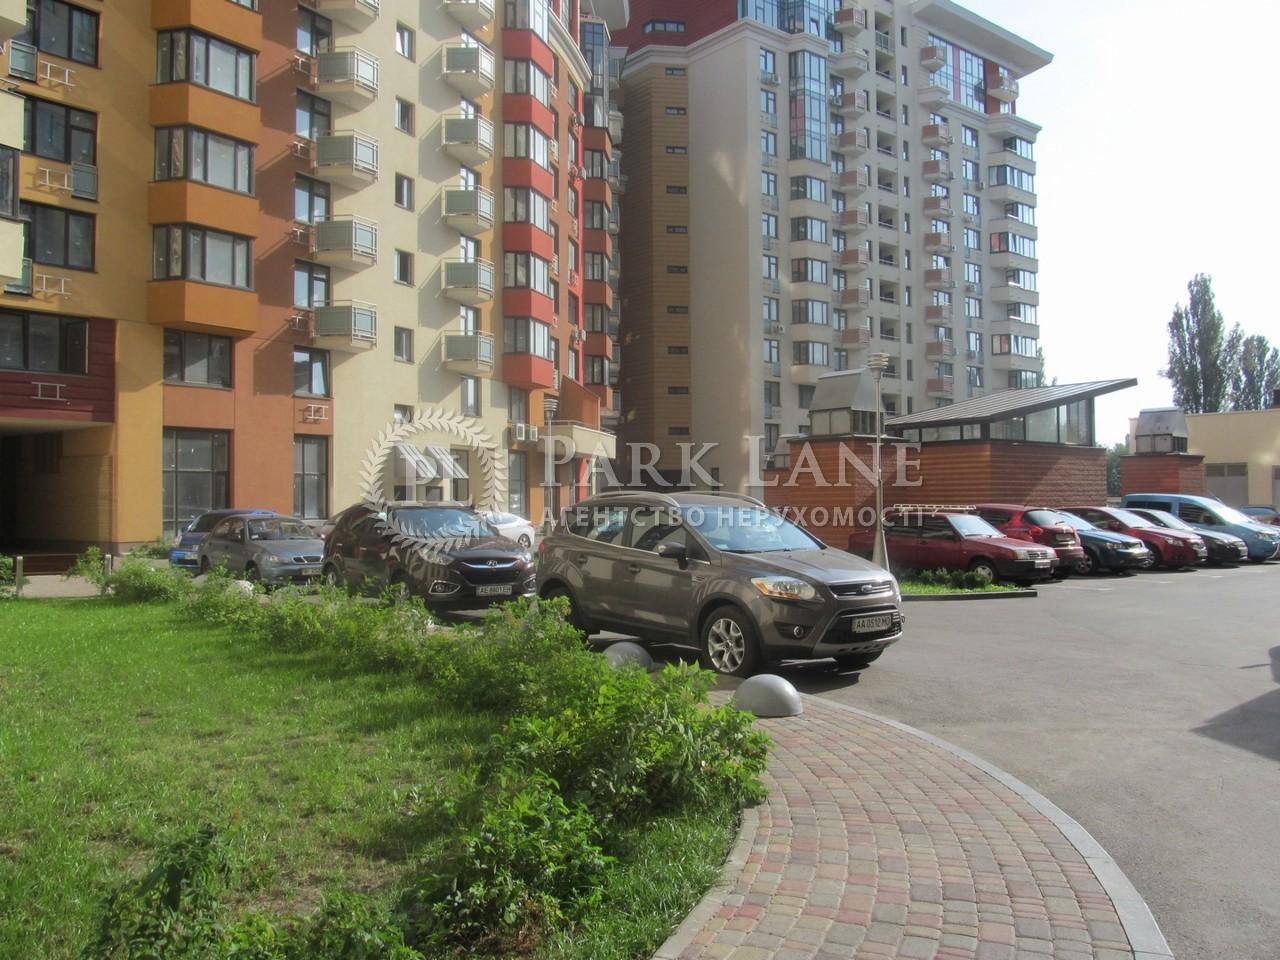 Квартира ул. Ломоносова, 71г, Киев, R-23617 - Фото 11